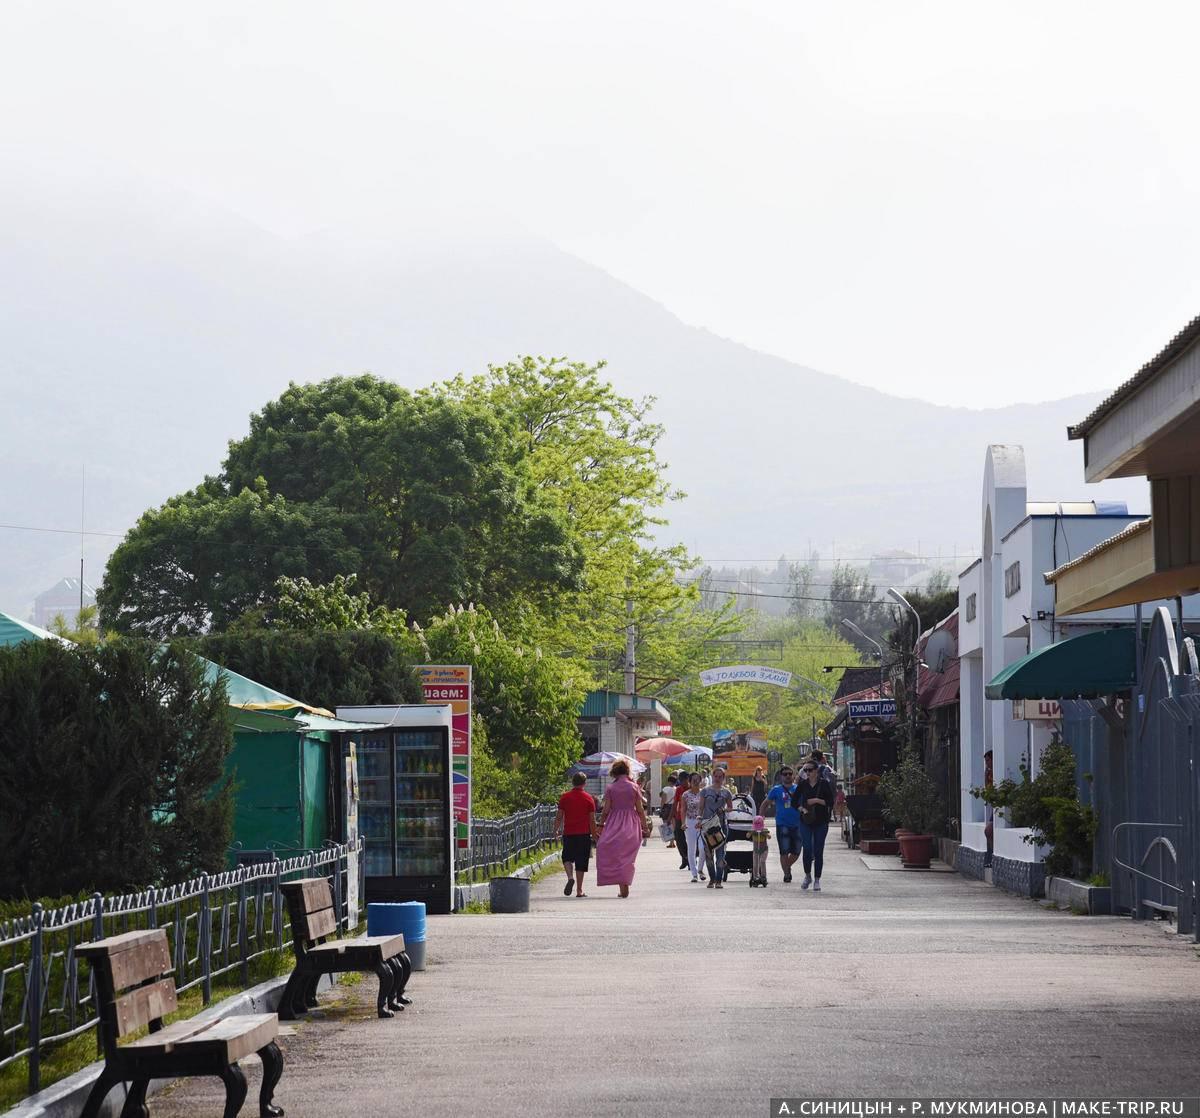 Отзывы туристов о Коктебеле